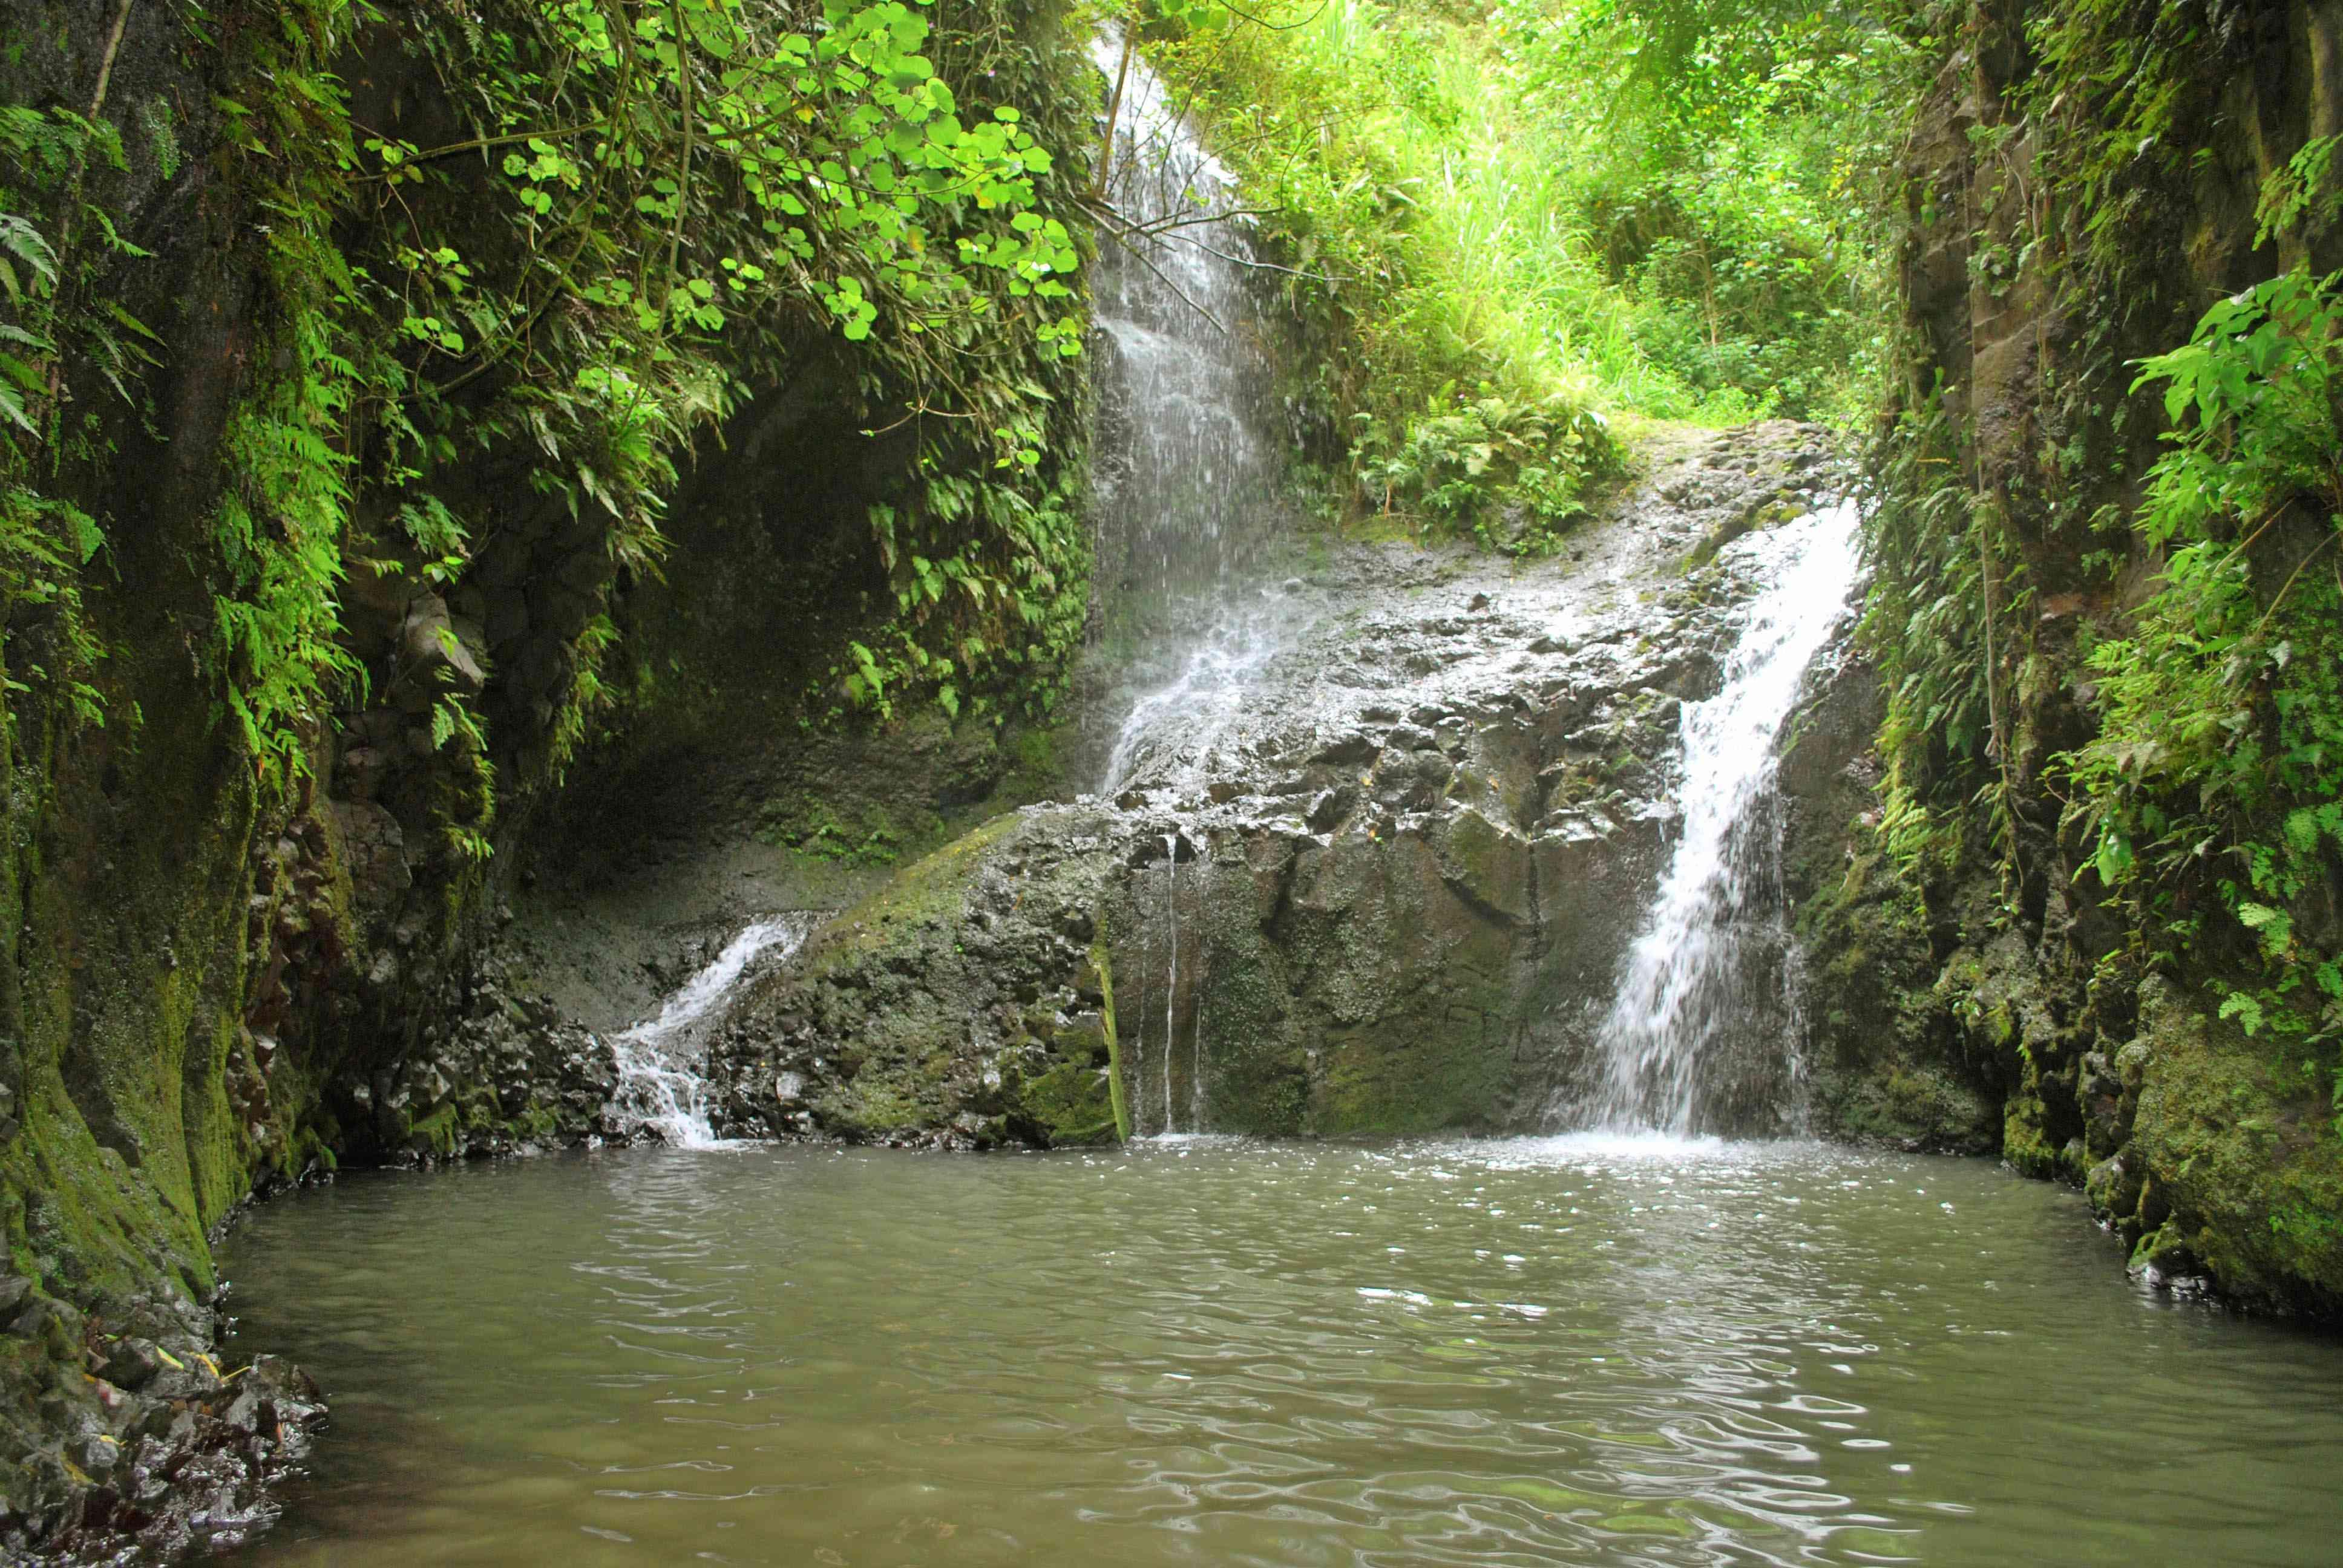 Maunawili Falls in Oahu, Hawaii